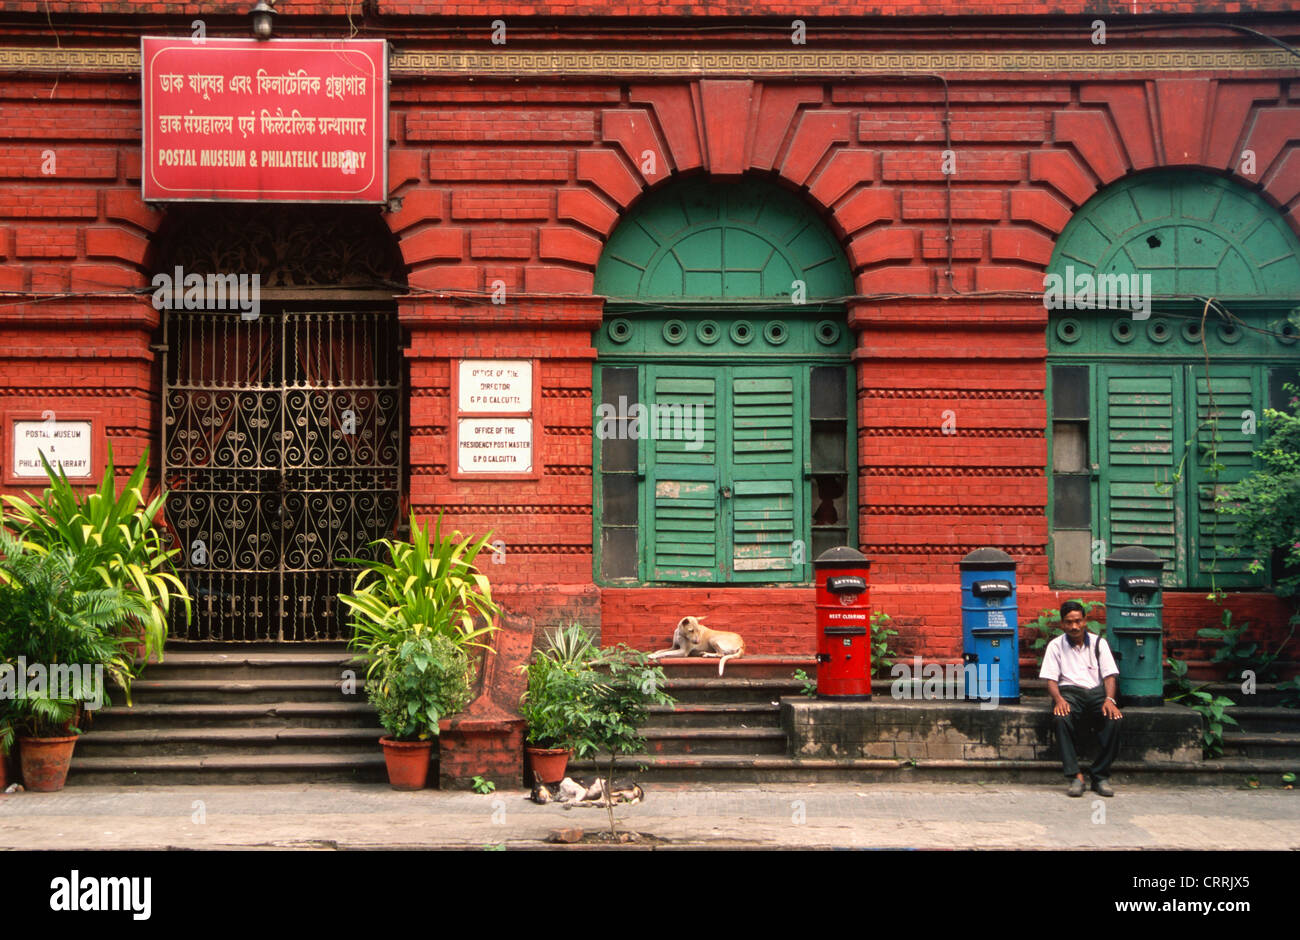 India; West Bengal, Kolkata, Calcutta, Postal Museum, - Stock Image